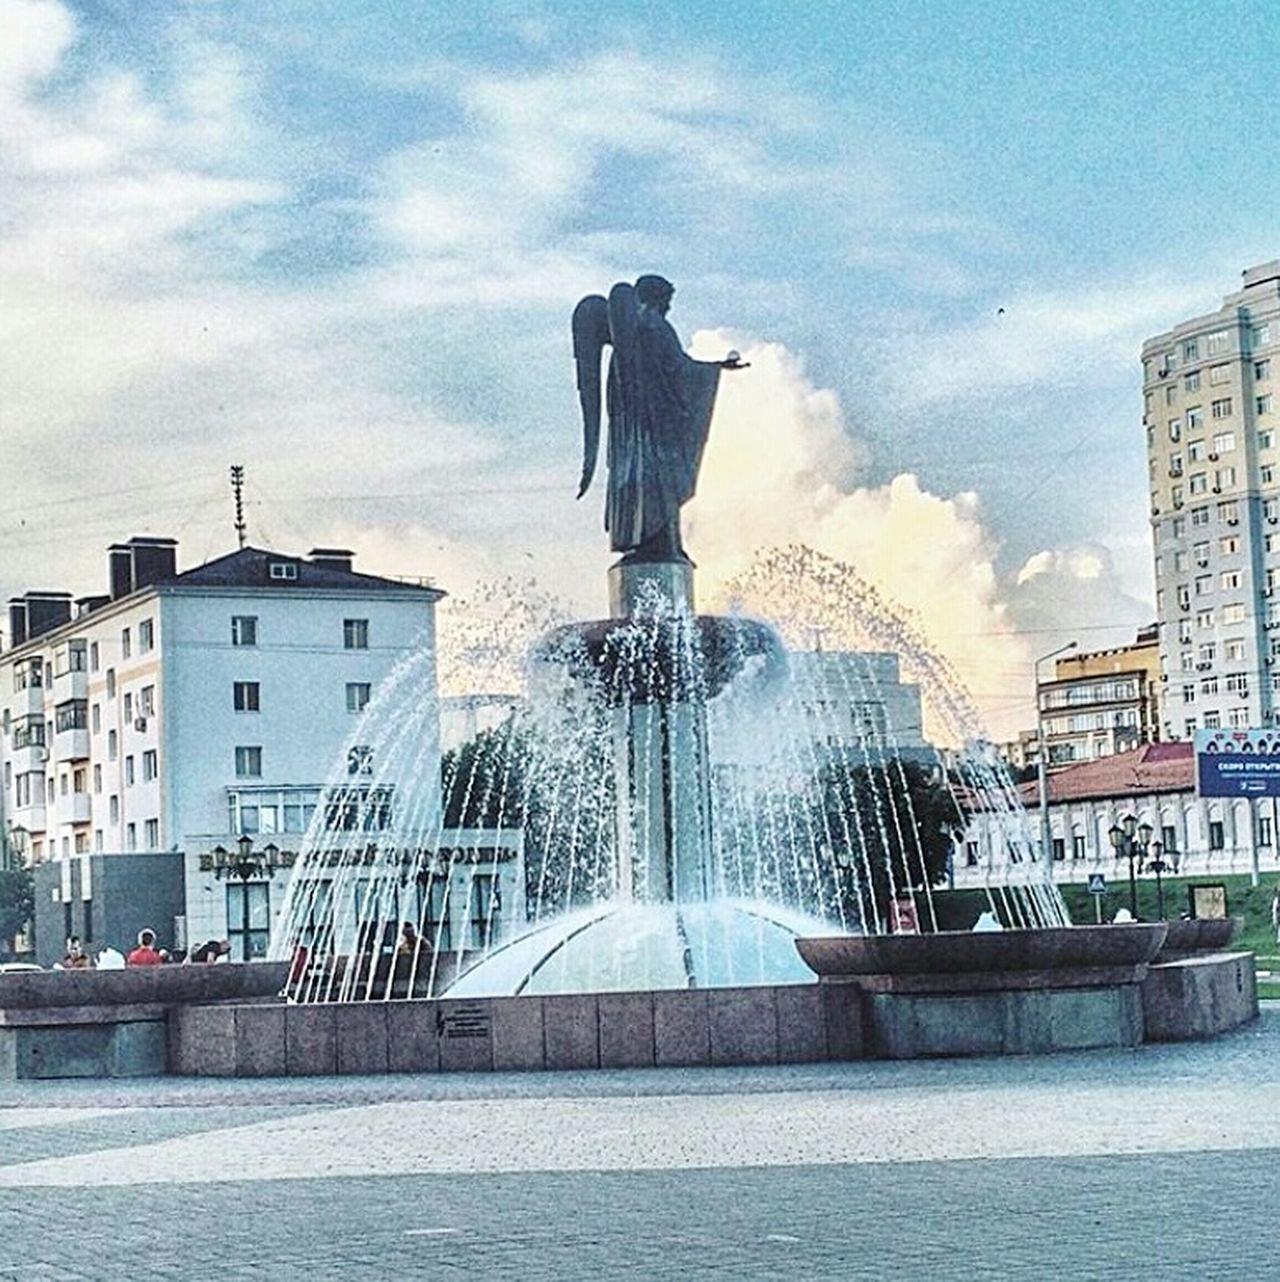 City Architecture памятник площадь фонтан